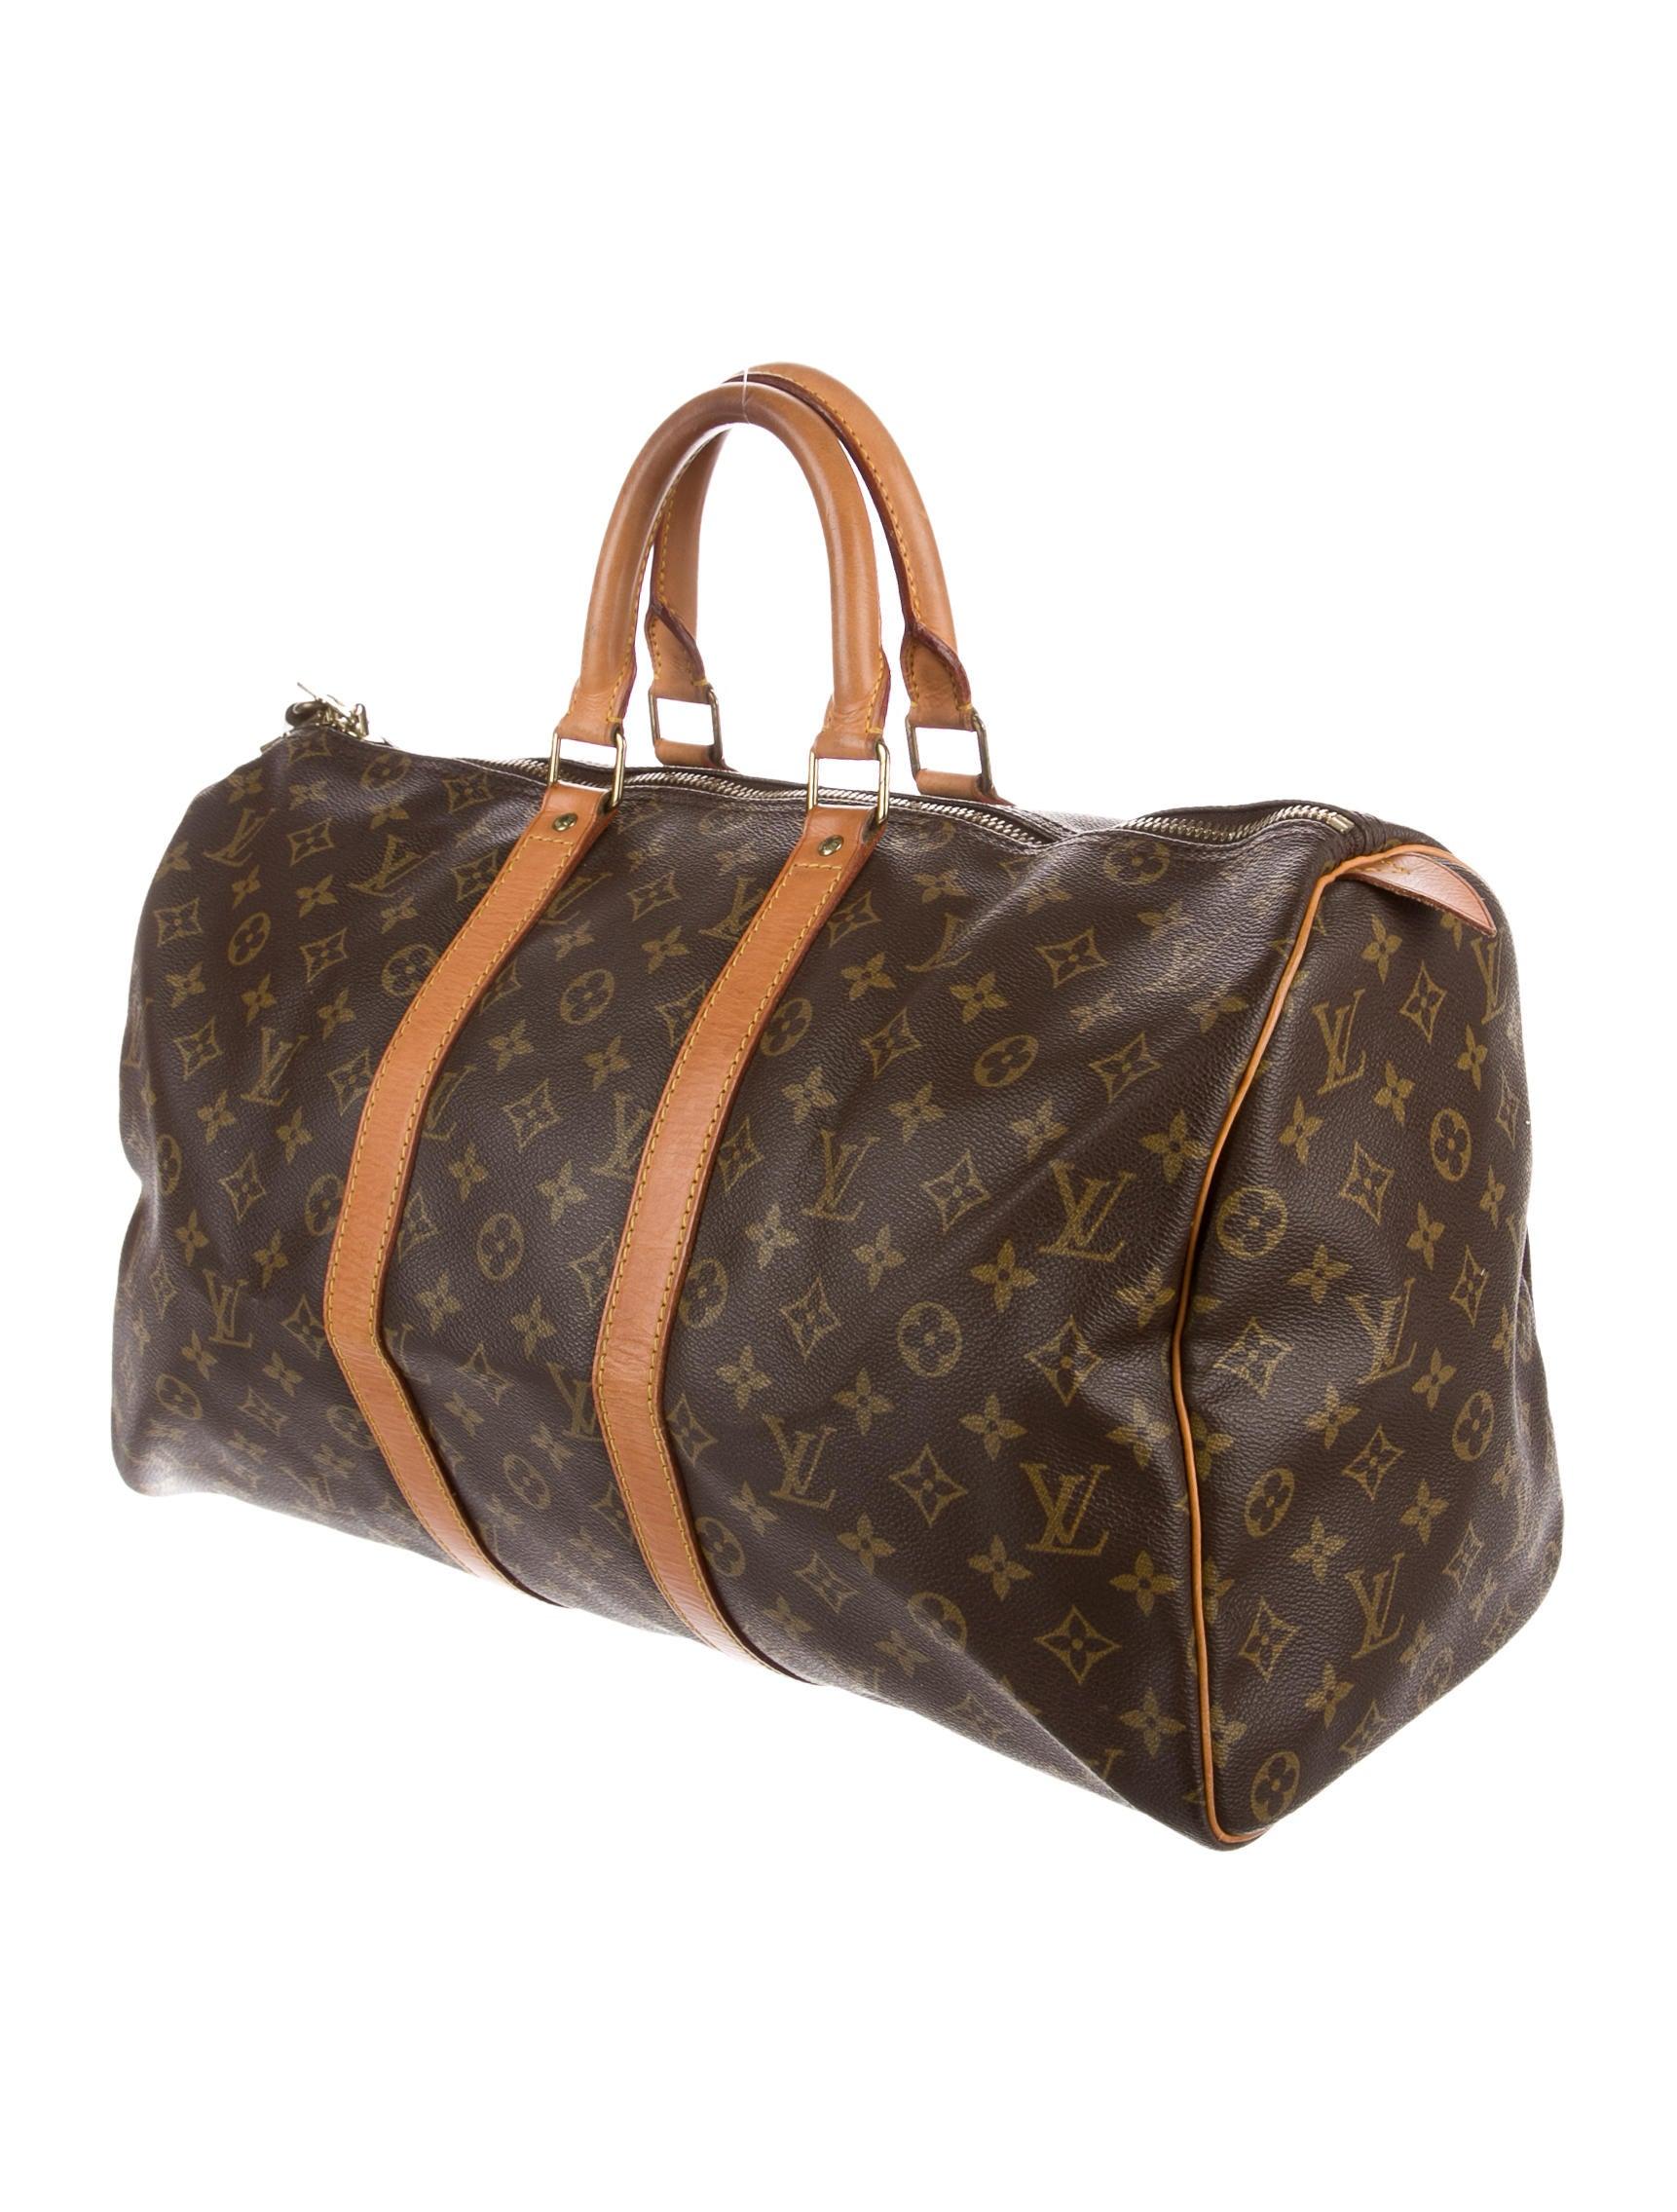 Louis Vuitton Monogram Keepall 45 - Handbags - LOU134086